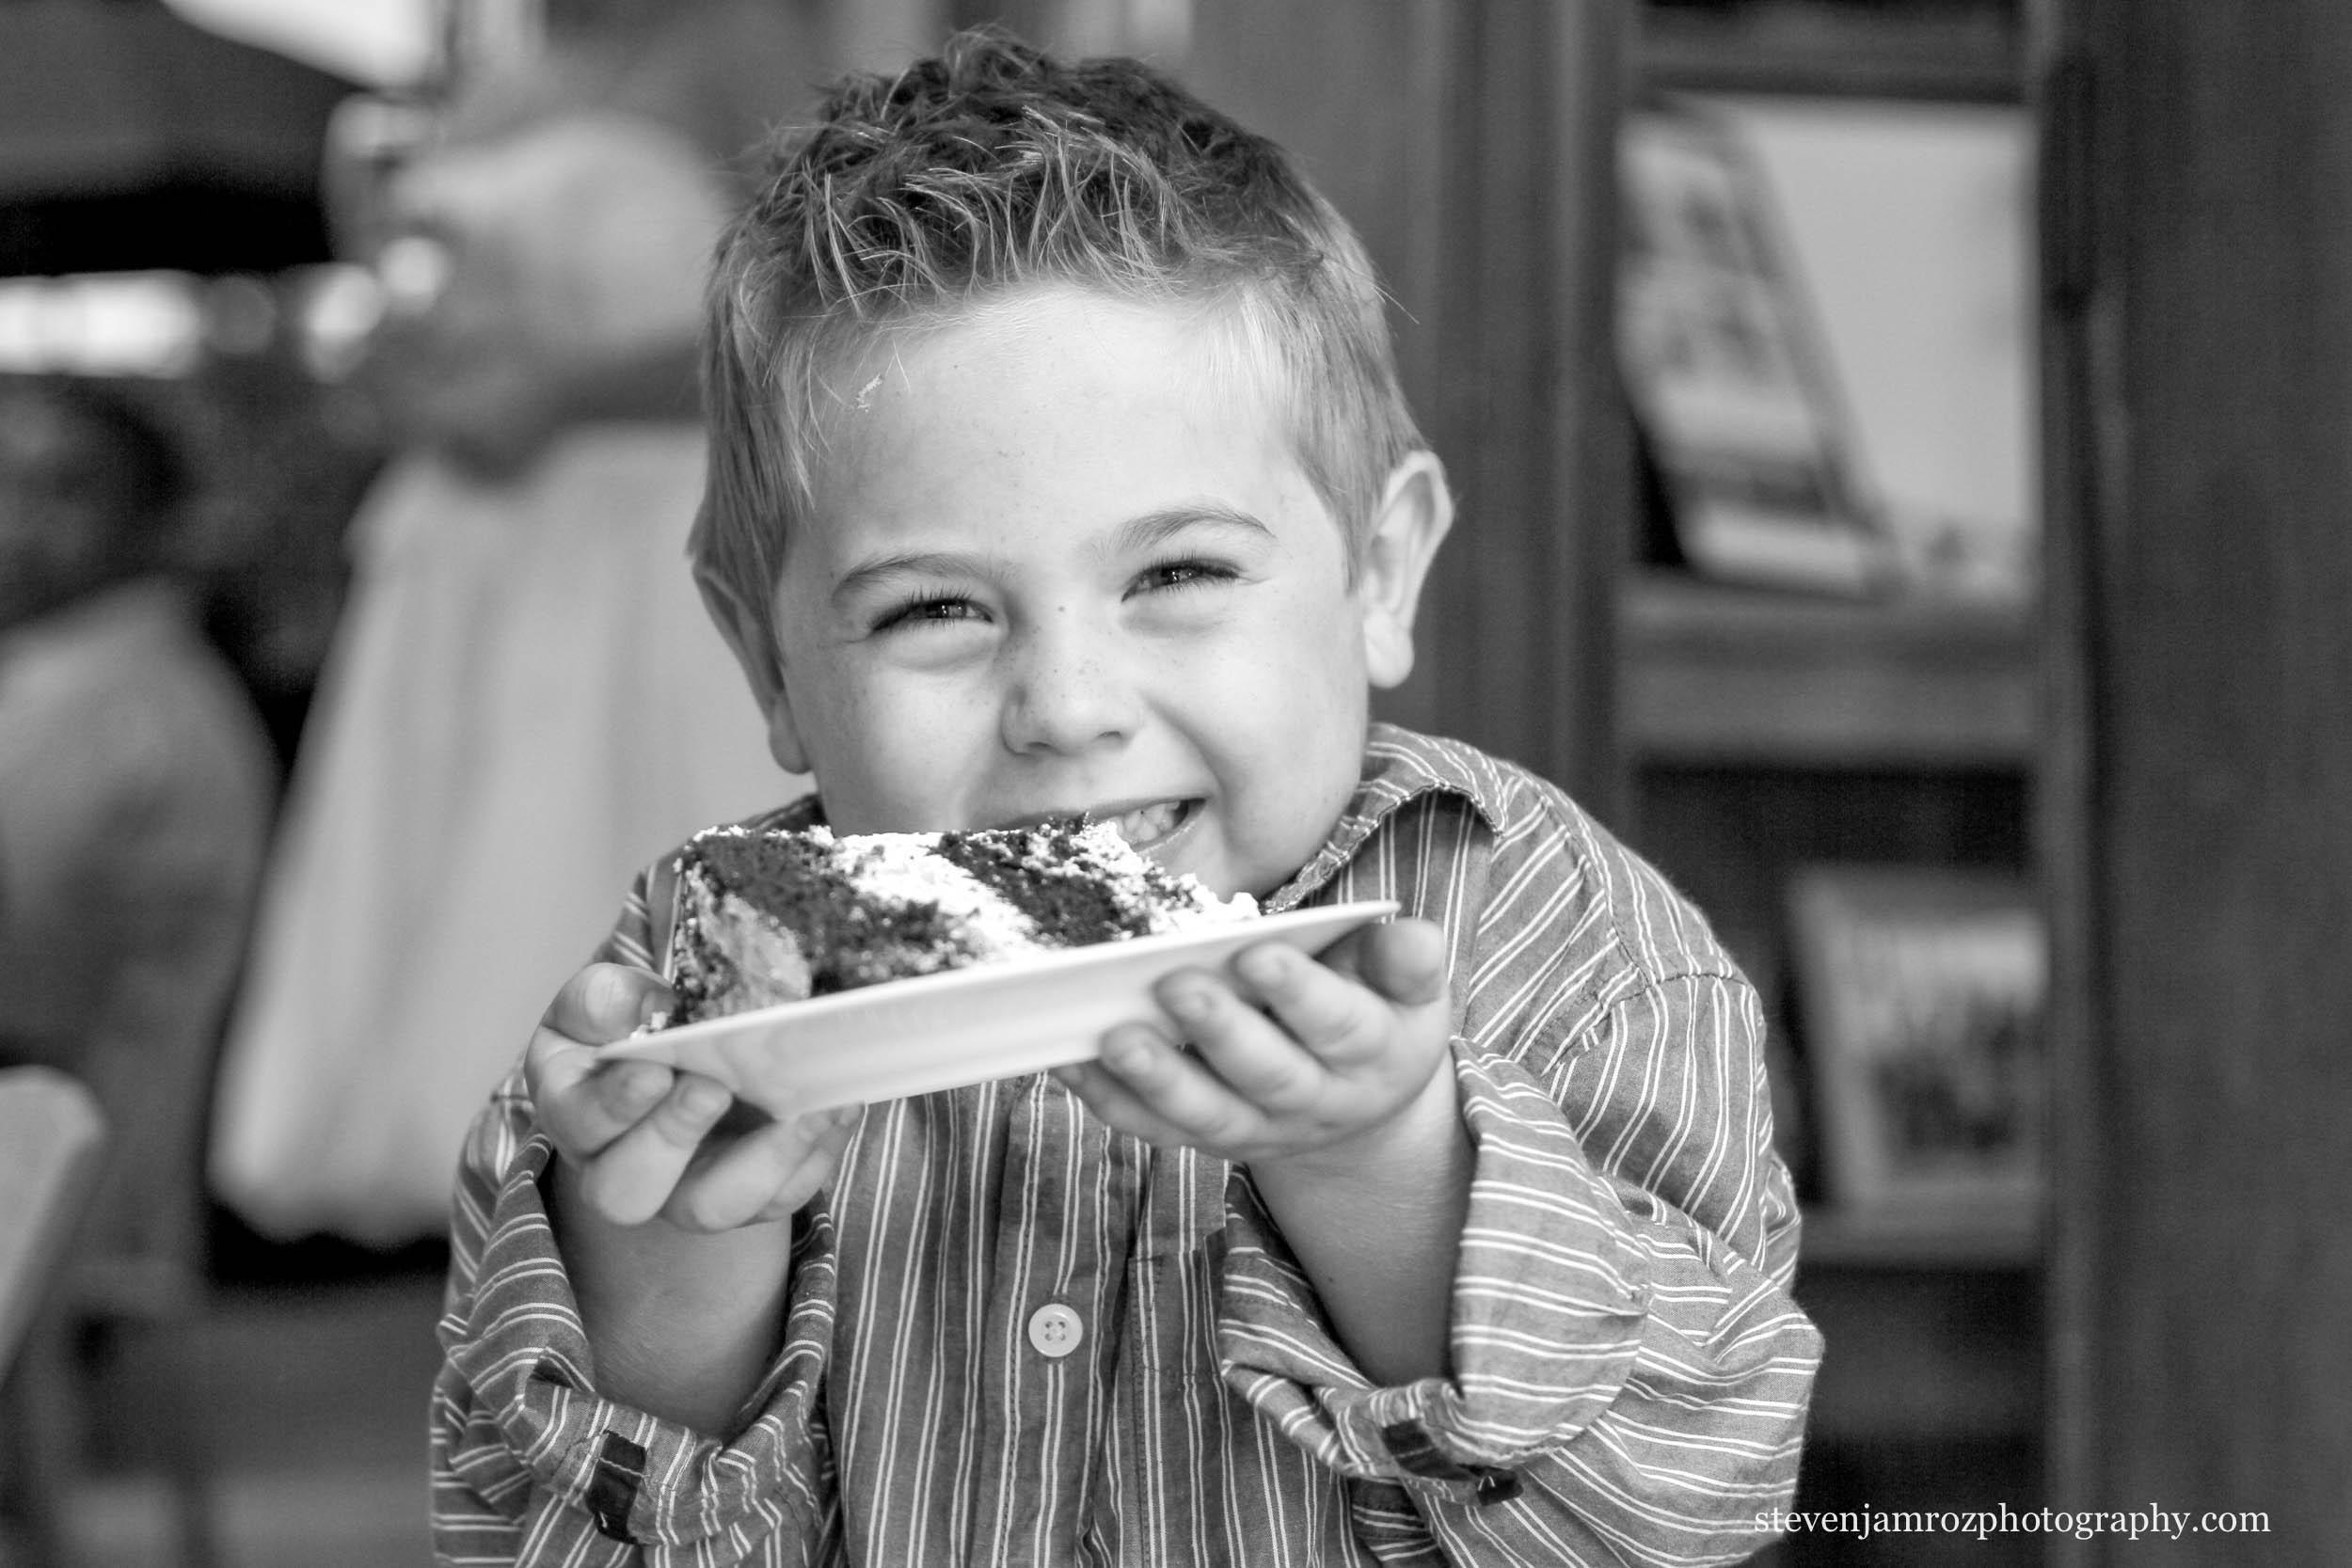 eating-cake-kid-wedding-raleigh-nc-steven-jamroz-photography-0060.jpg